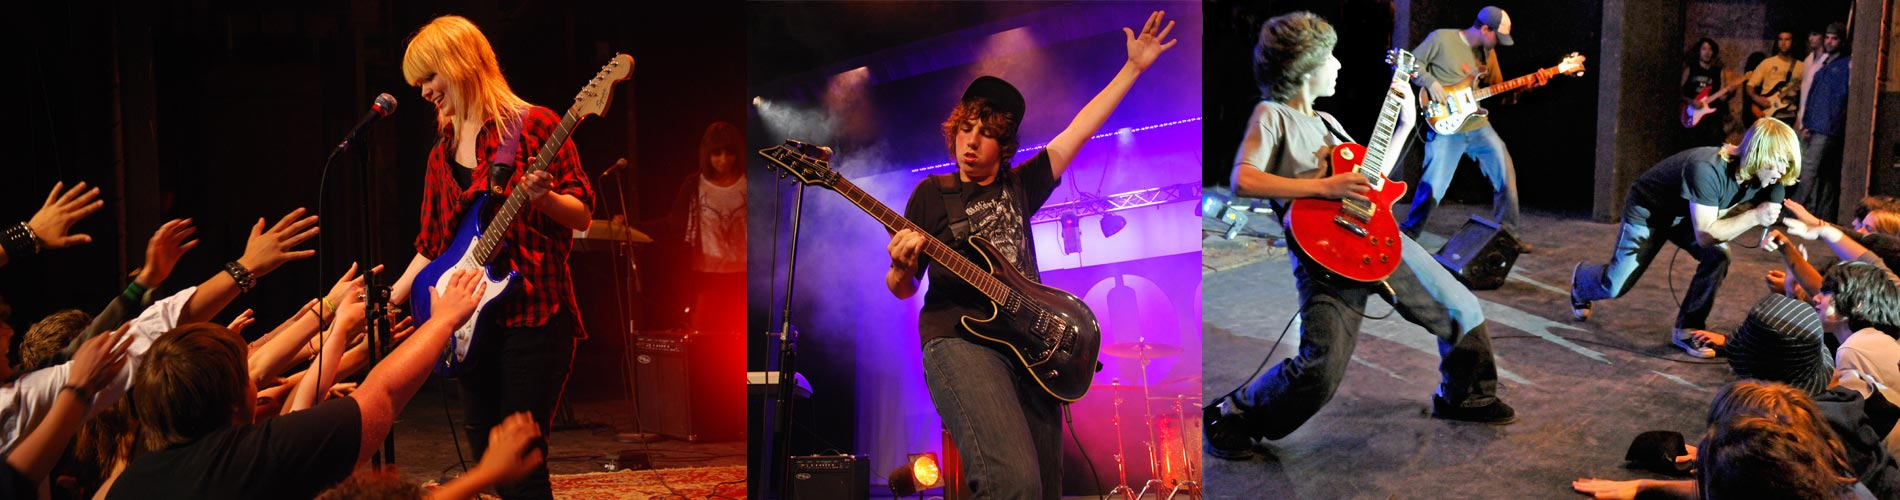 rock-camp-001